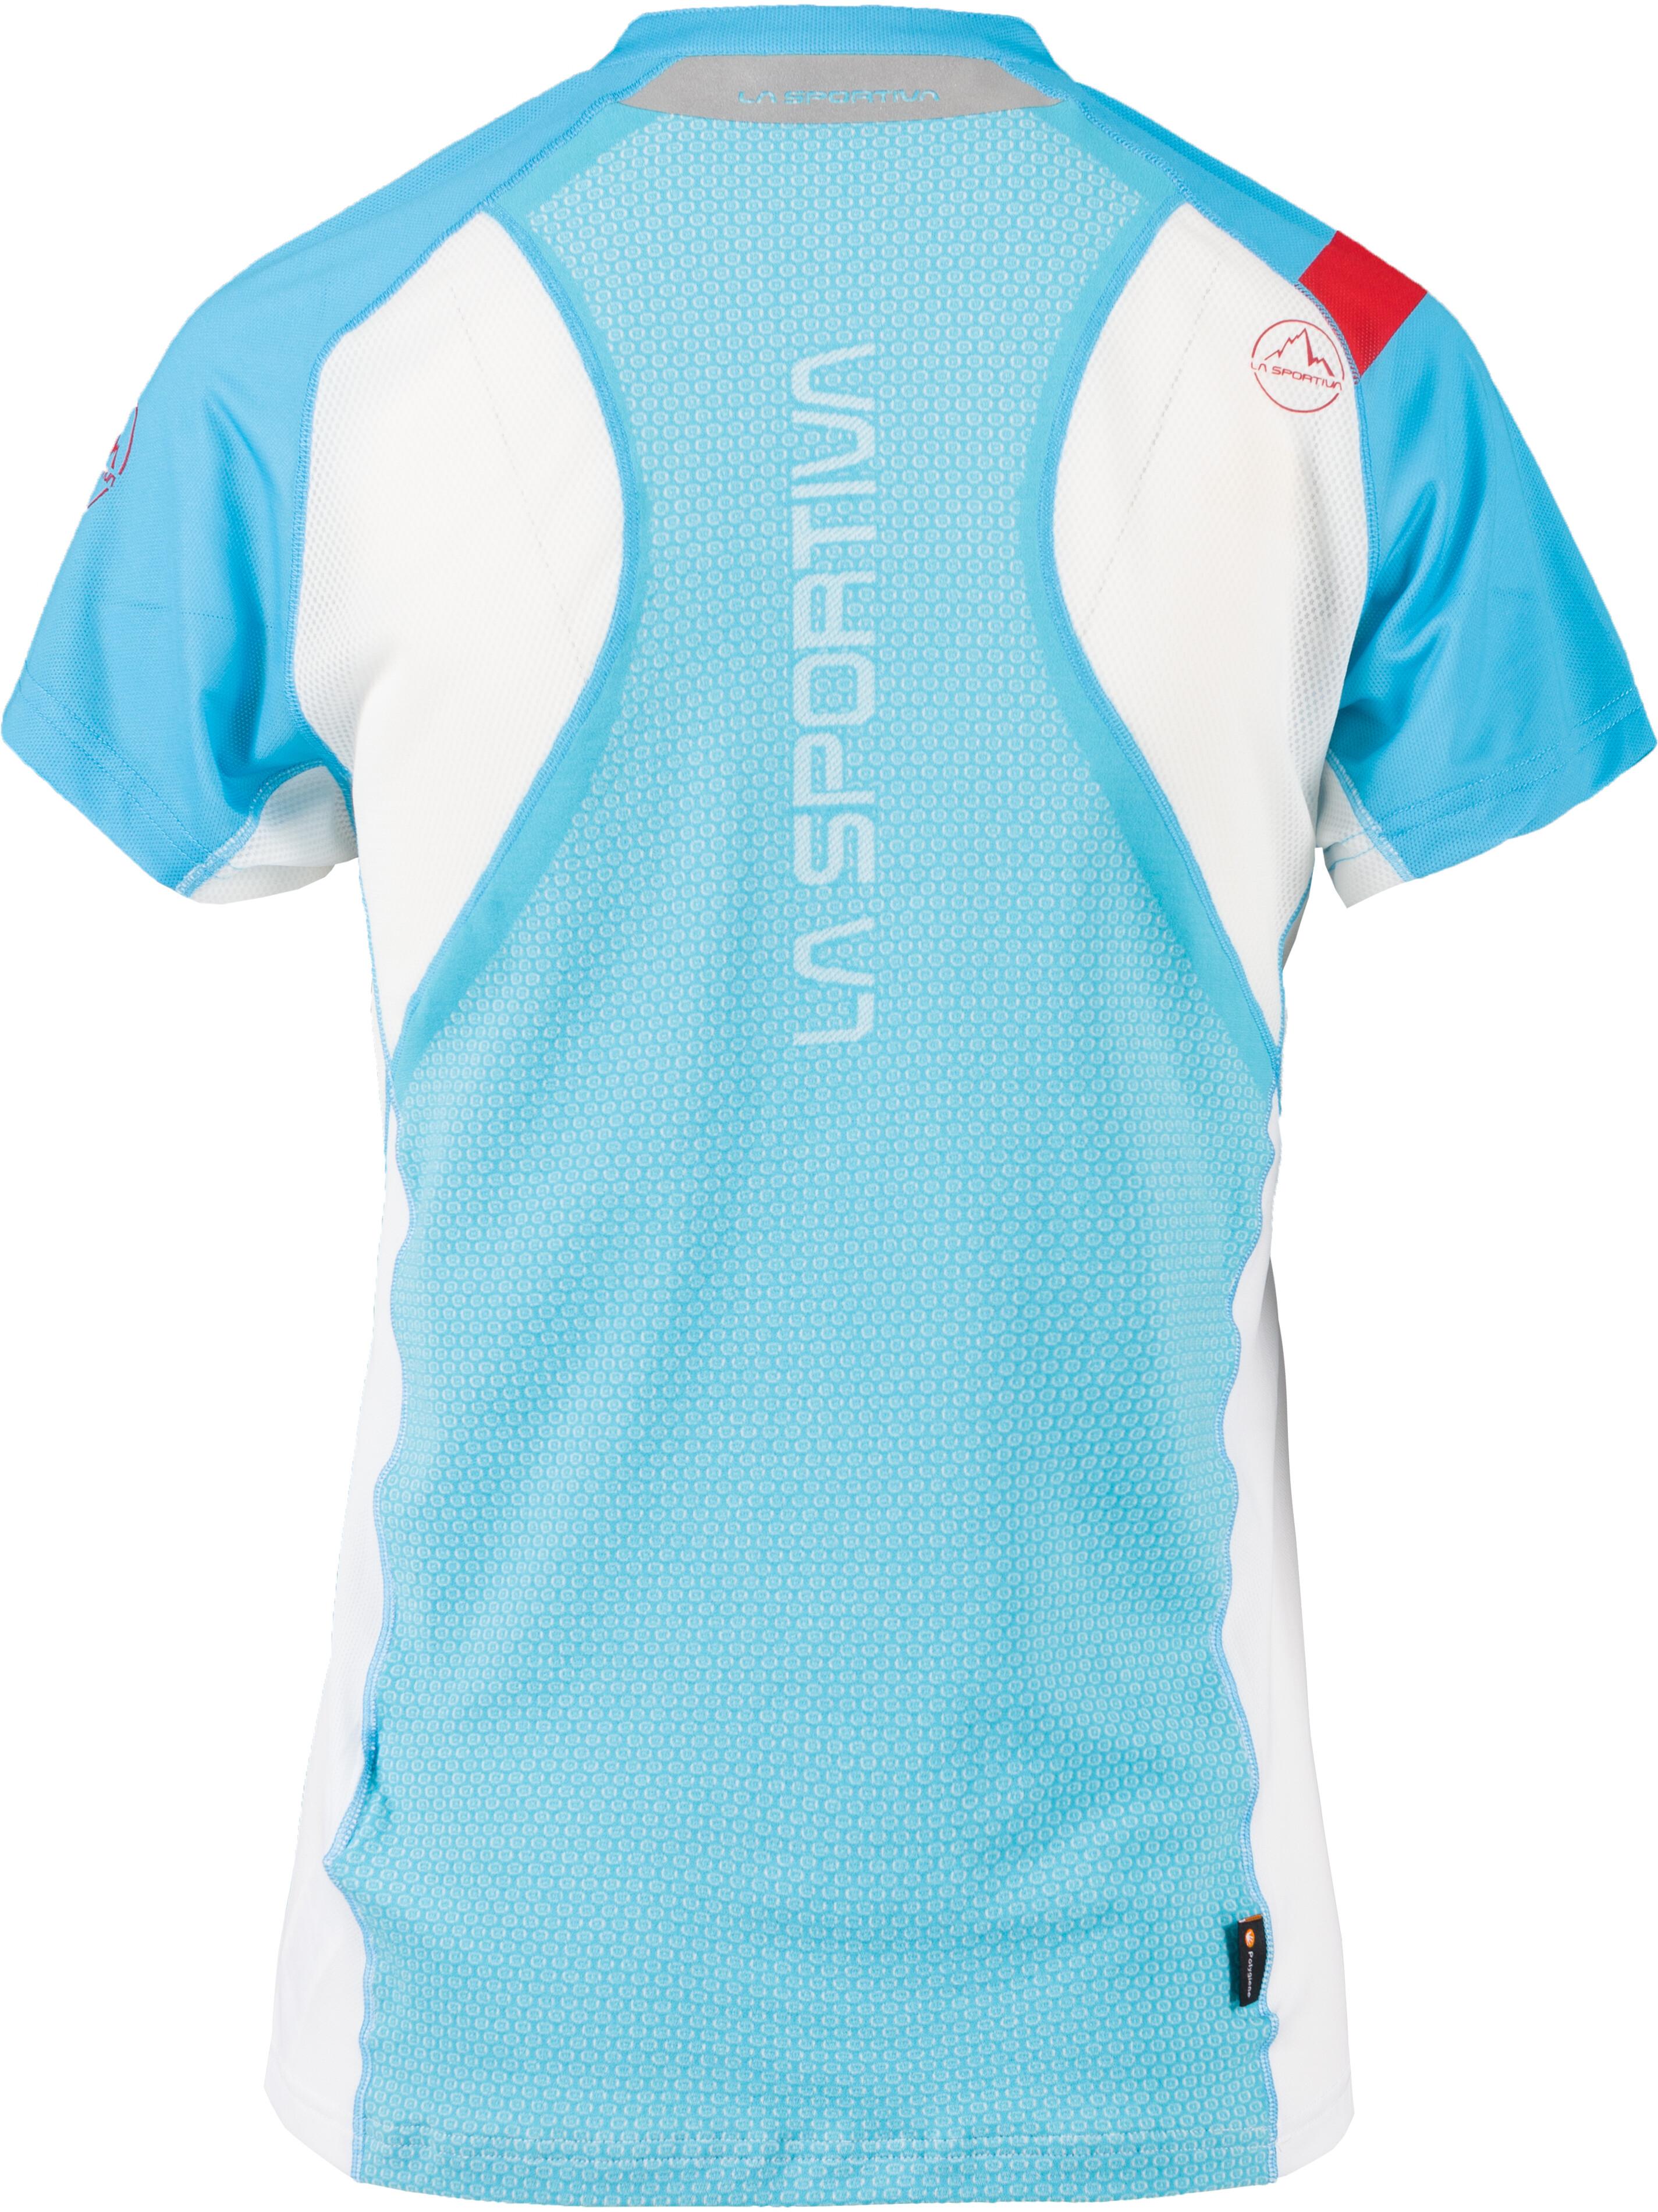 La Sportiva Veloce T-Shirt Donna, malibu blue/white (2020) 852112 9ZyNG